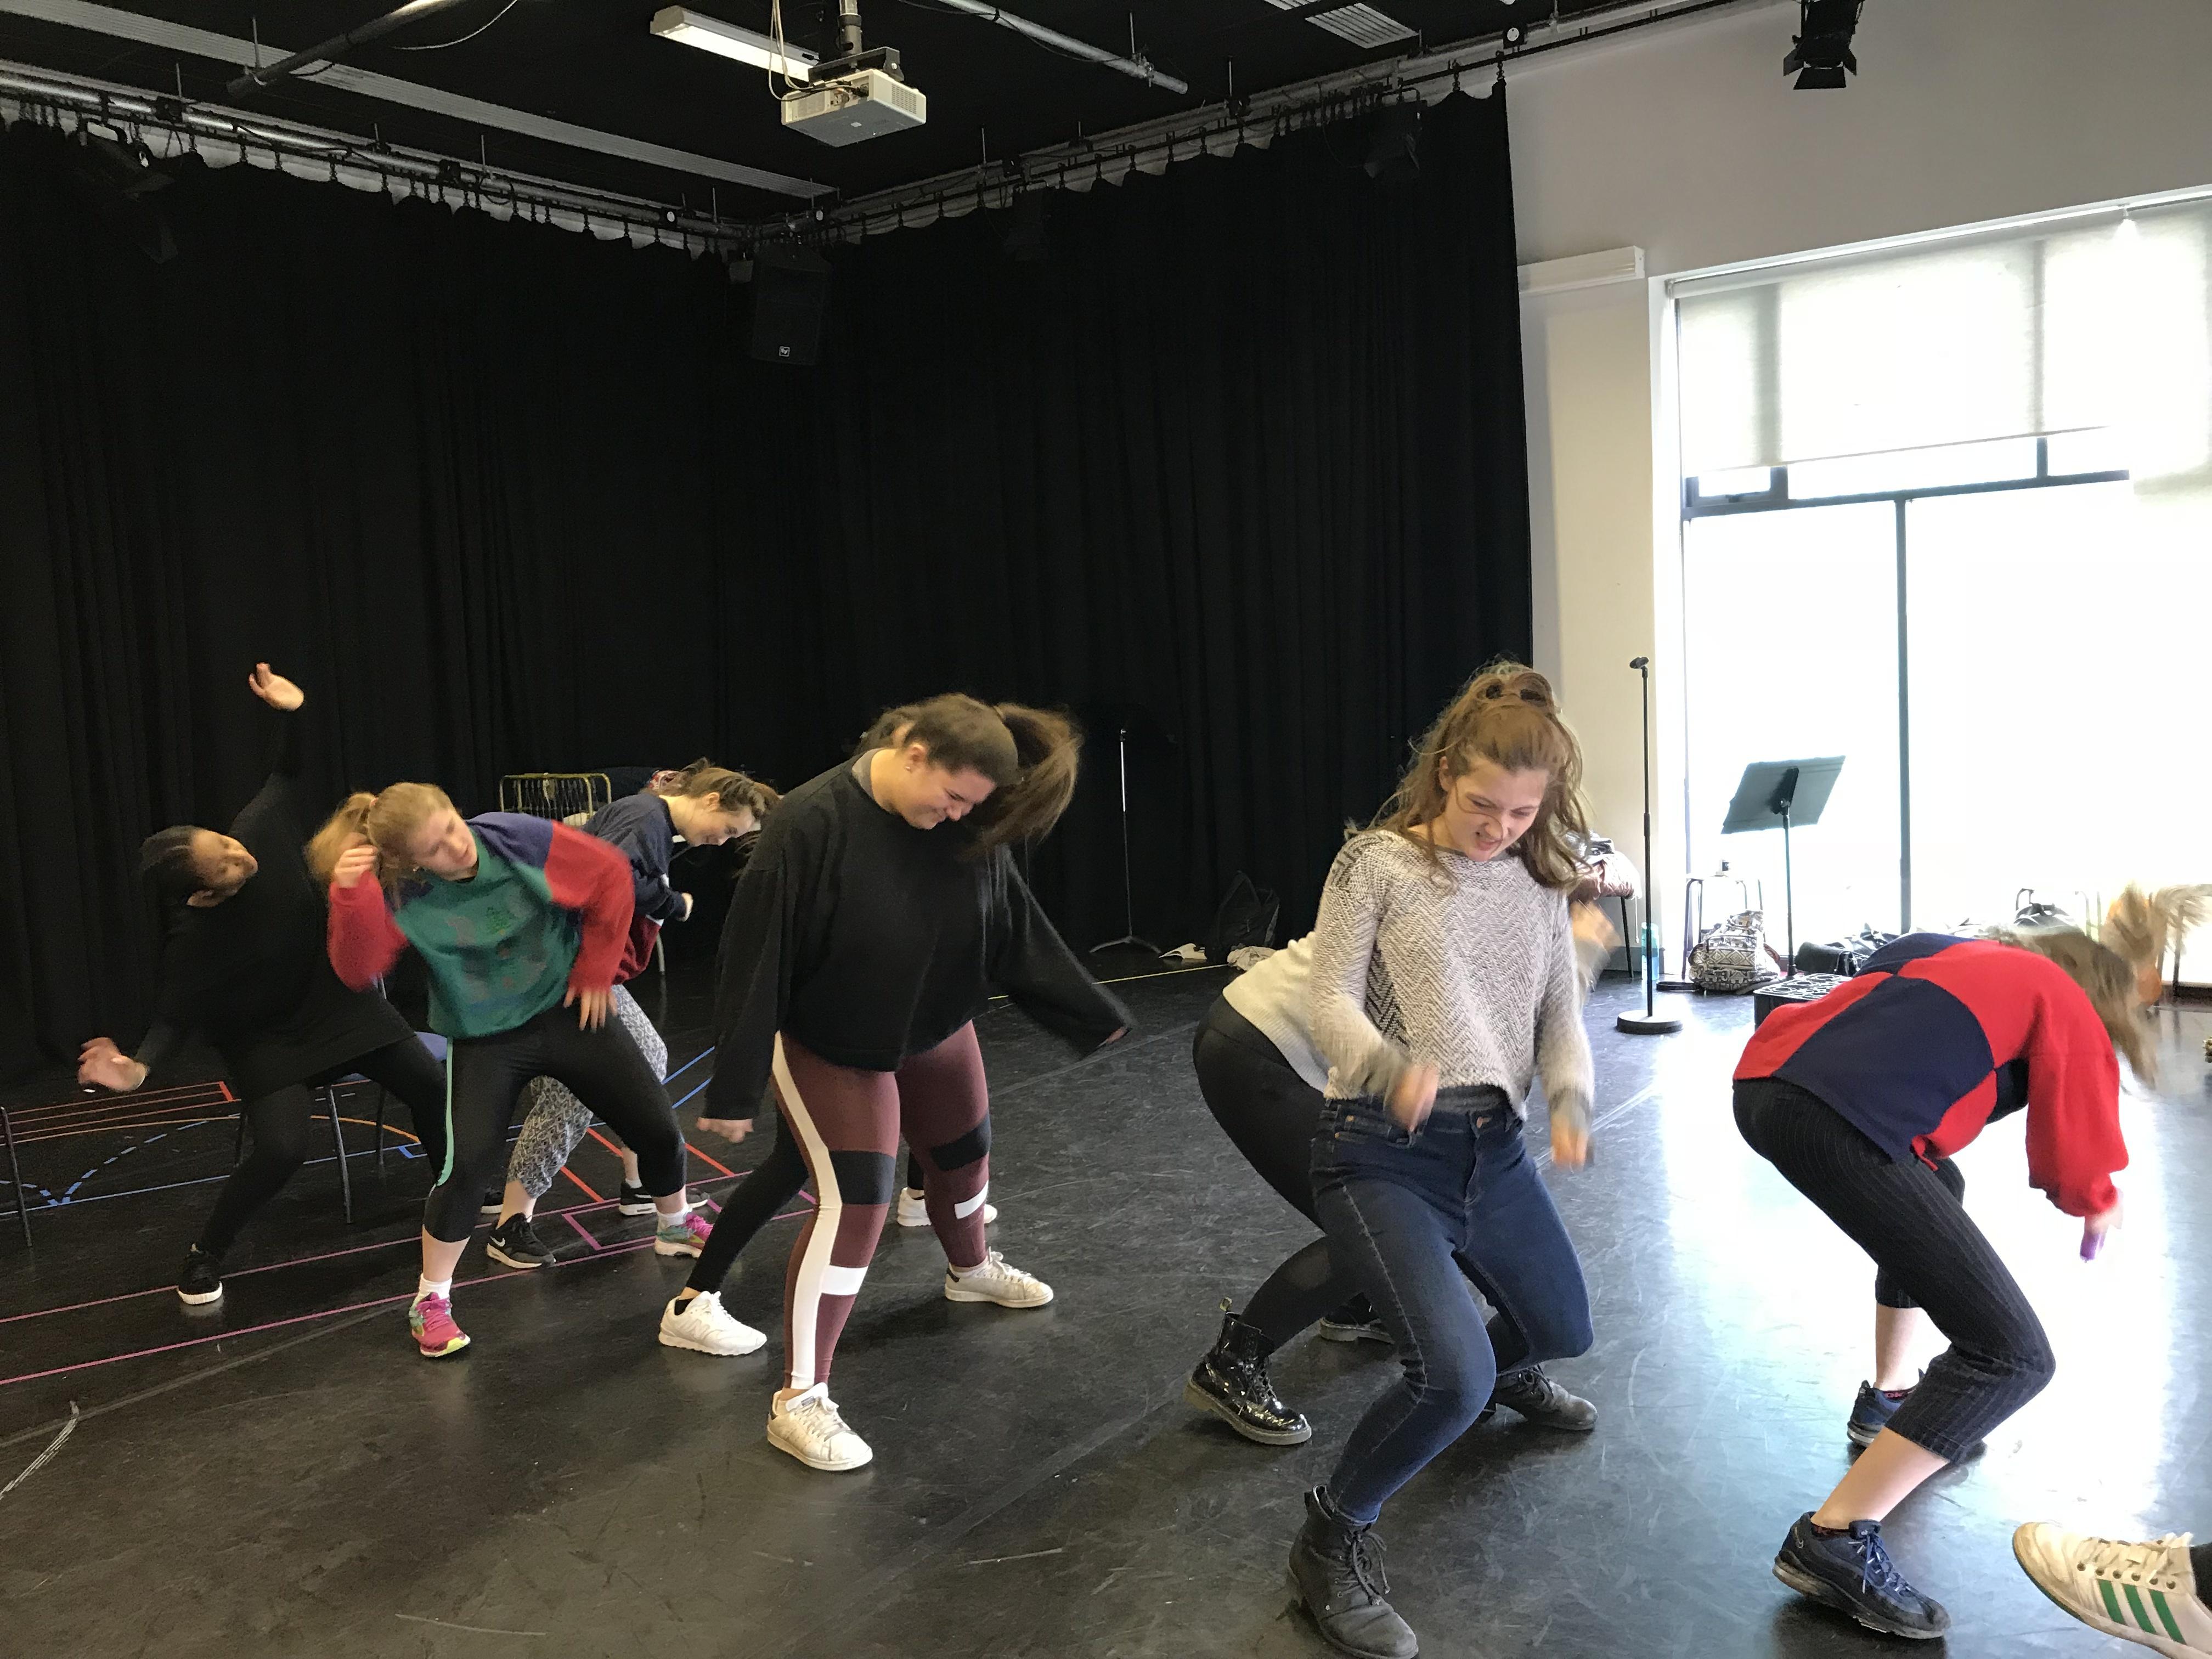 Lysistrata rehearsal - the chorus of women